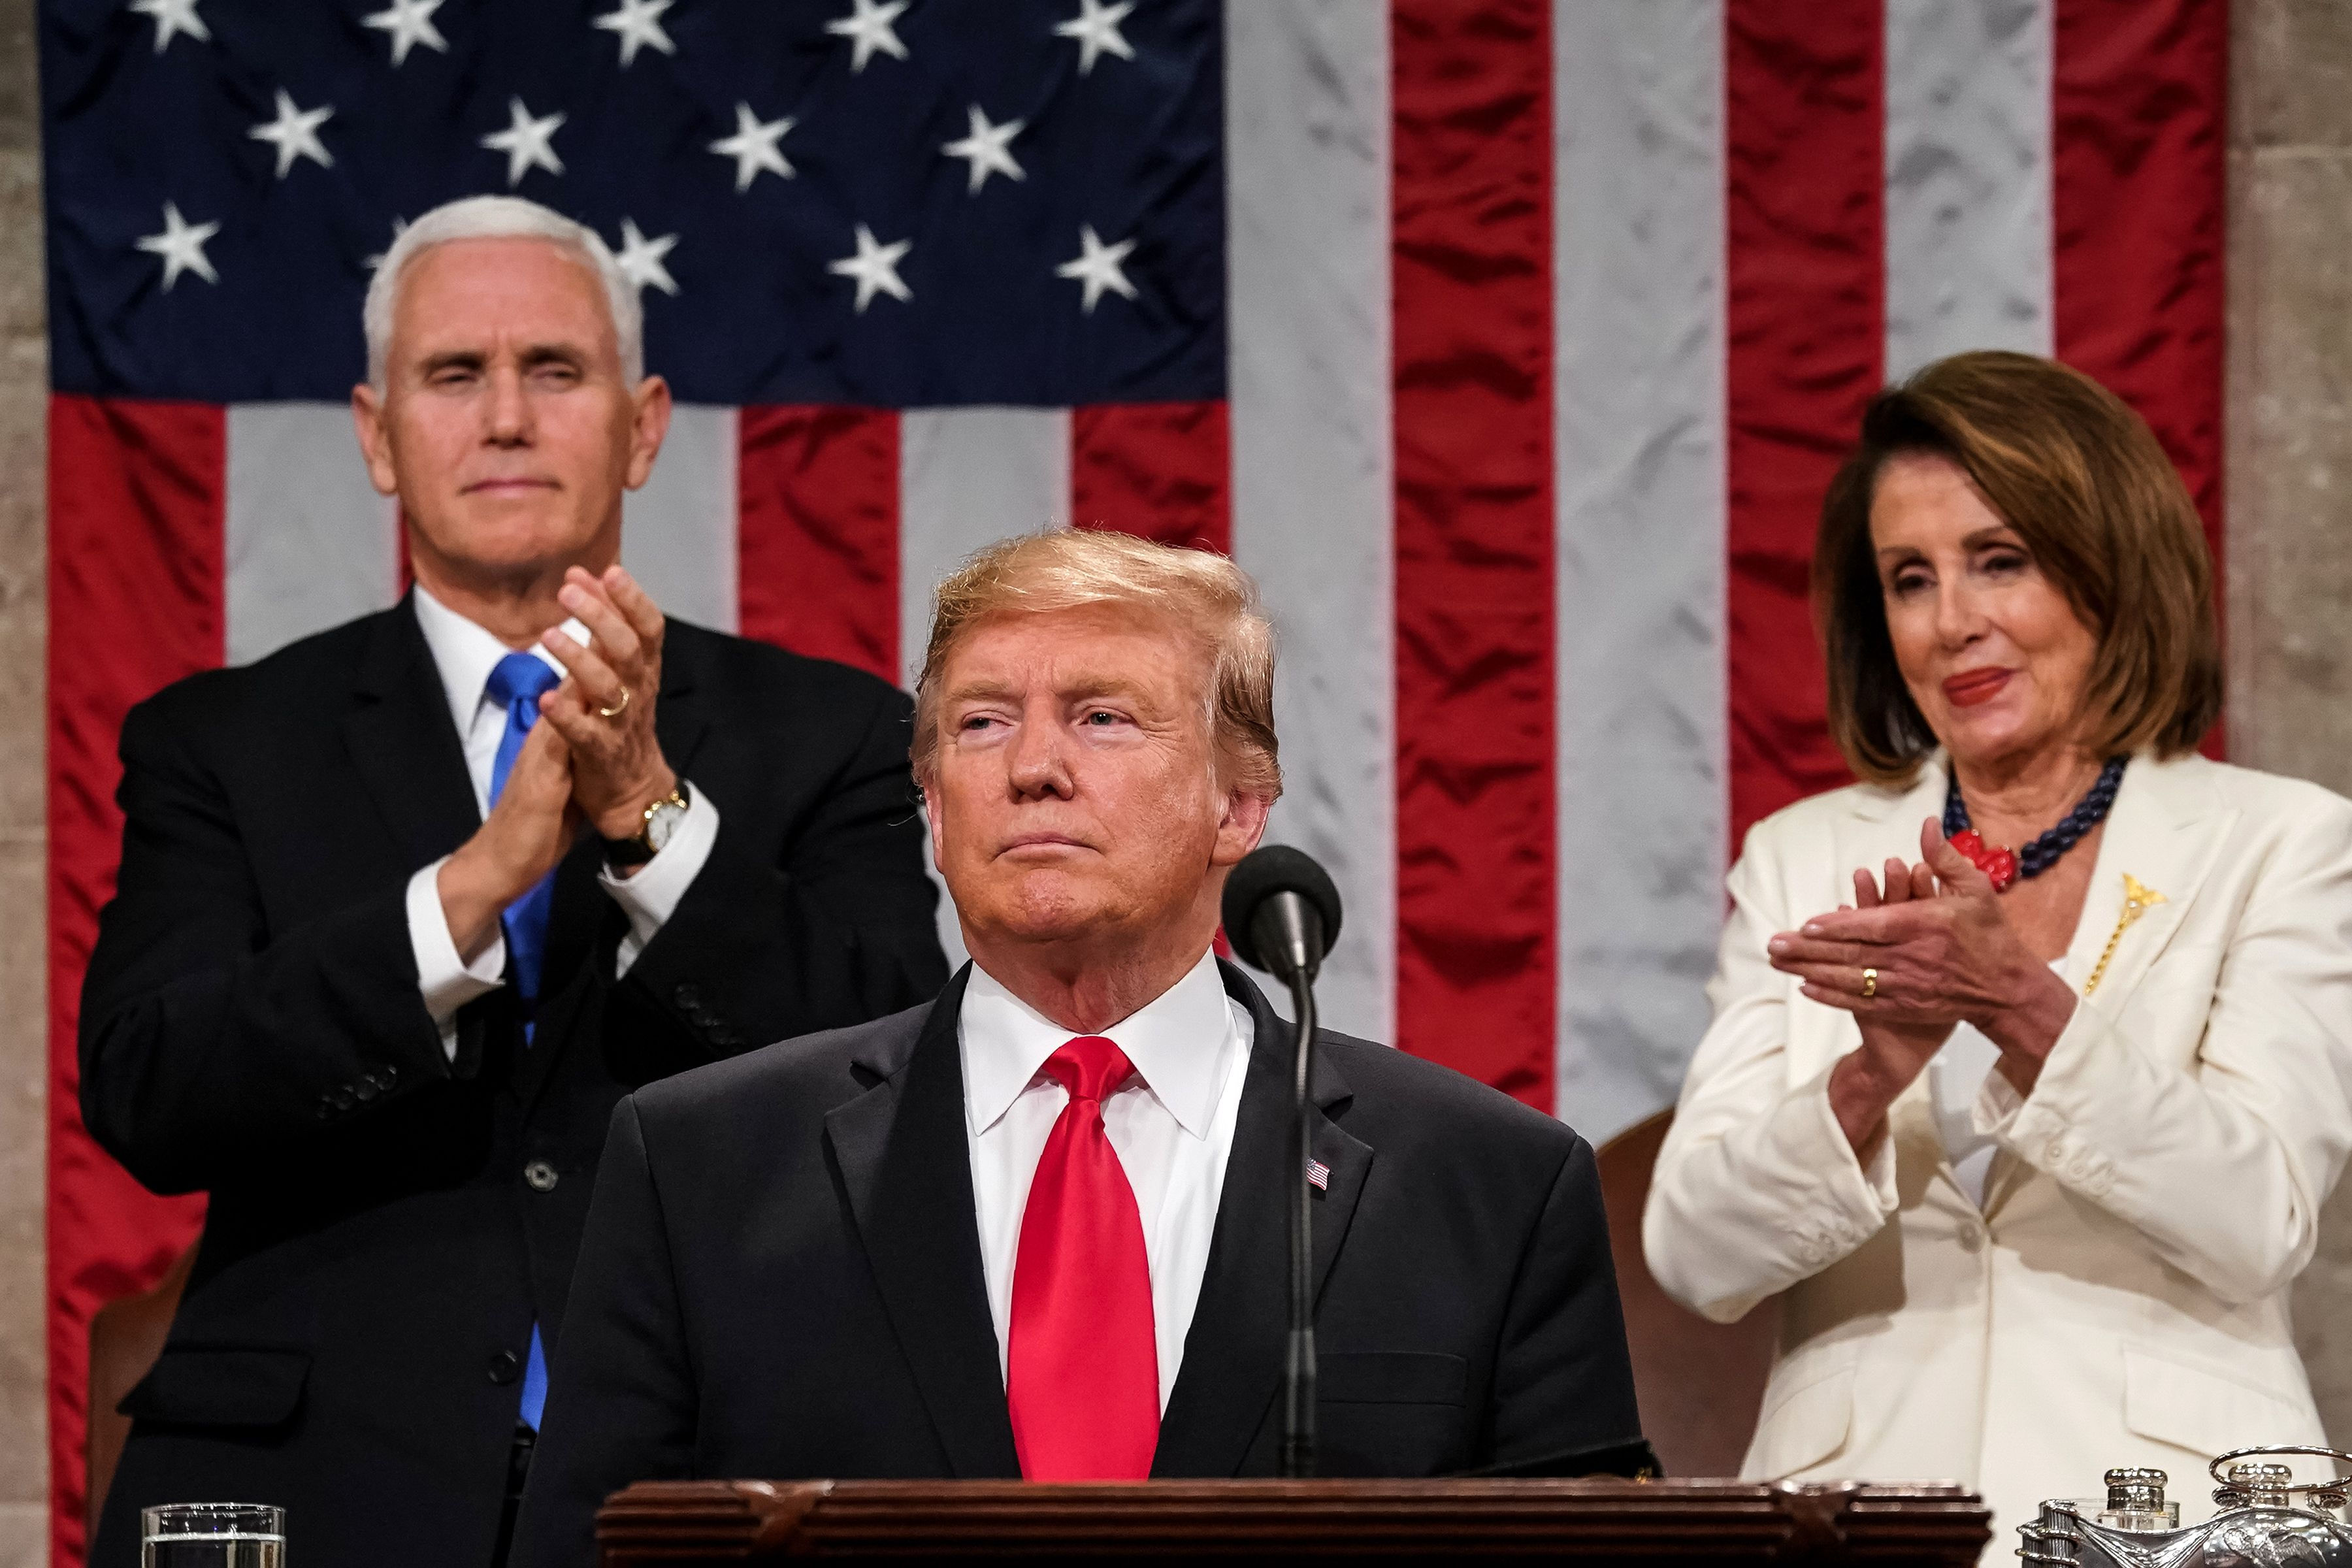 Congressional negotiators seek contours of border deal as shutdown